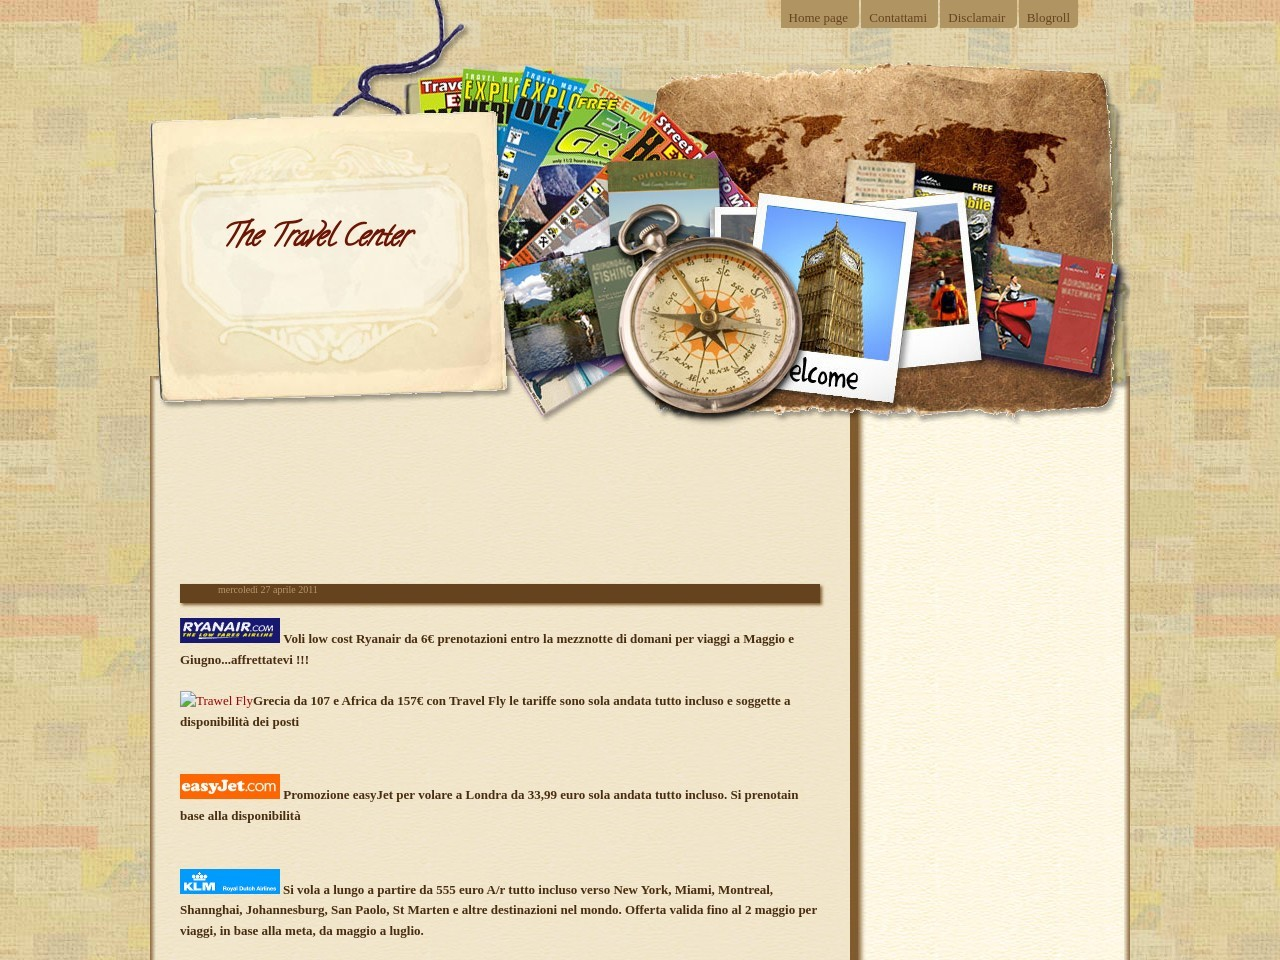 the-travel-center